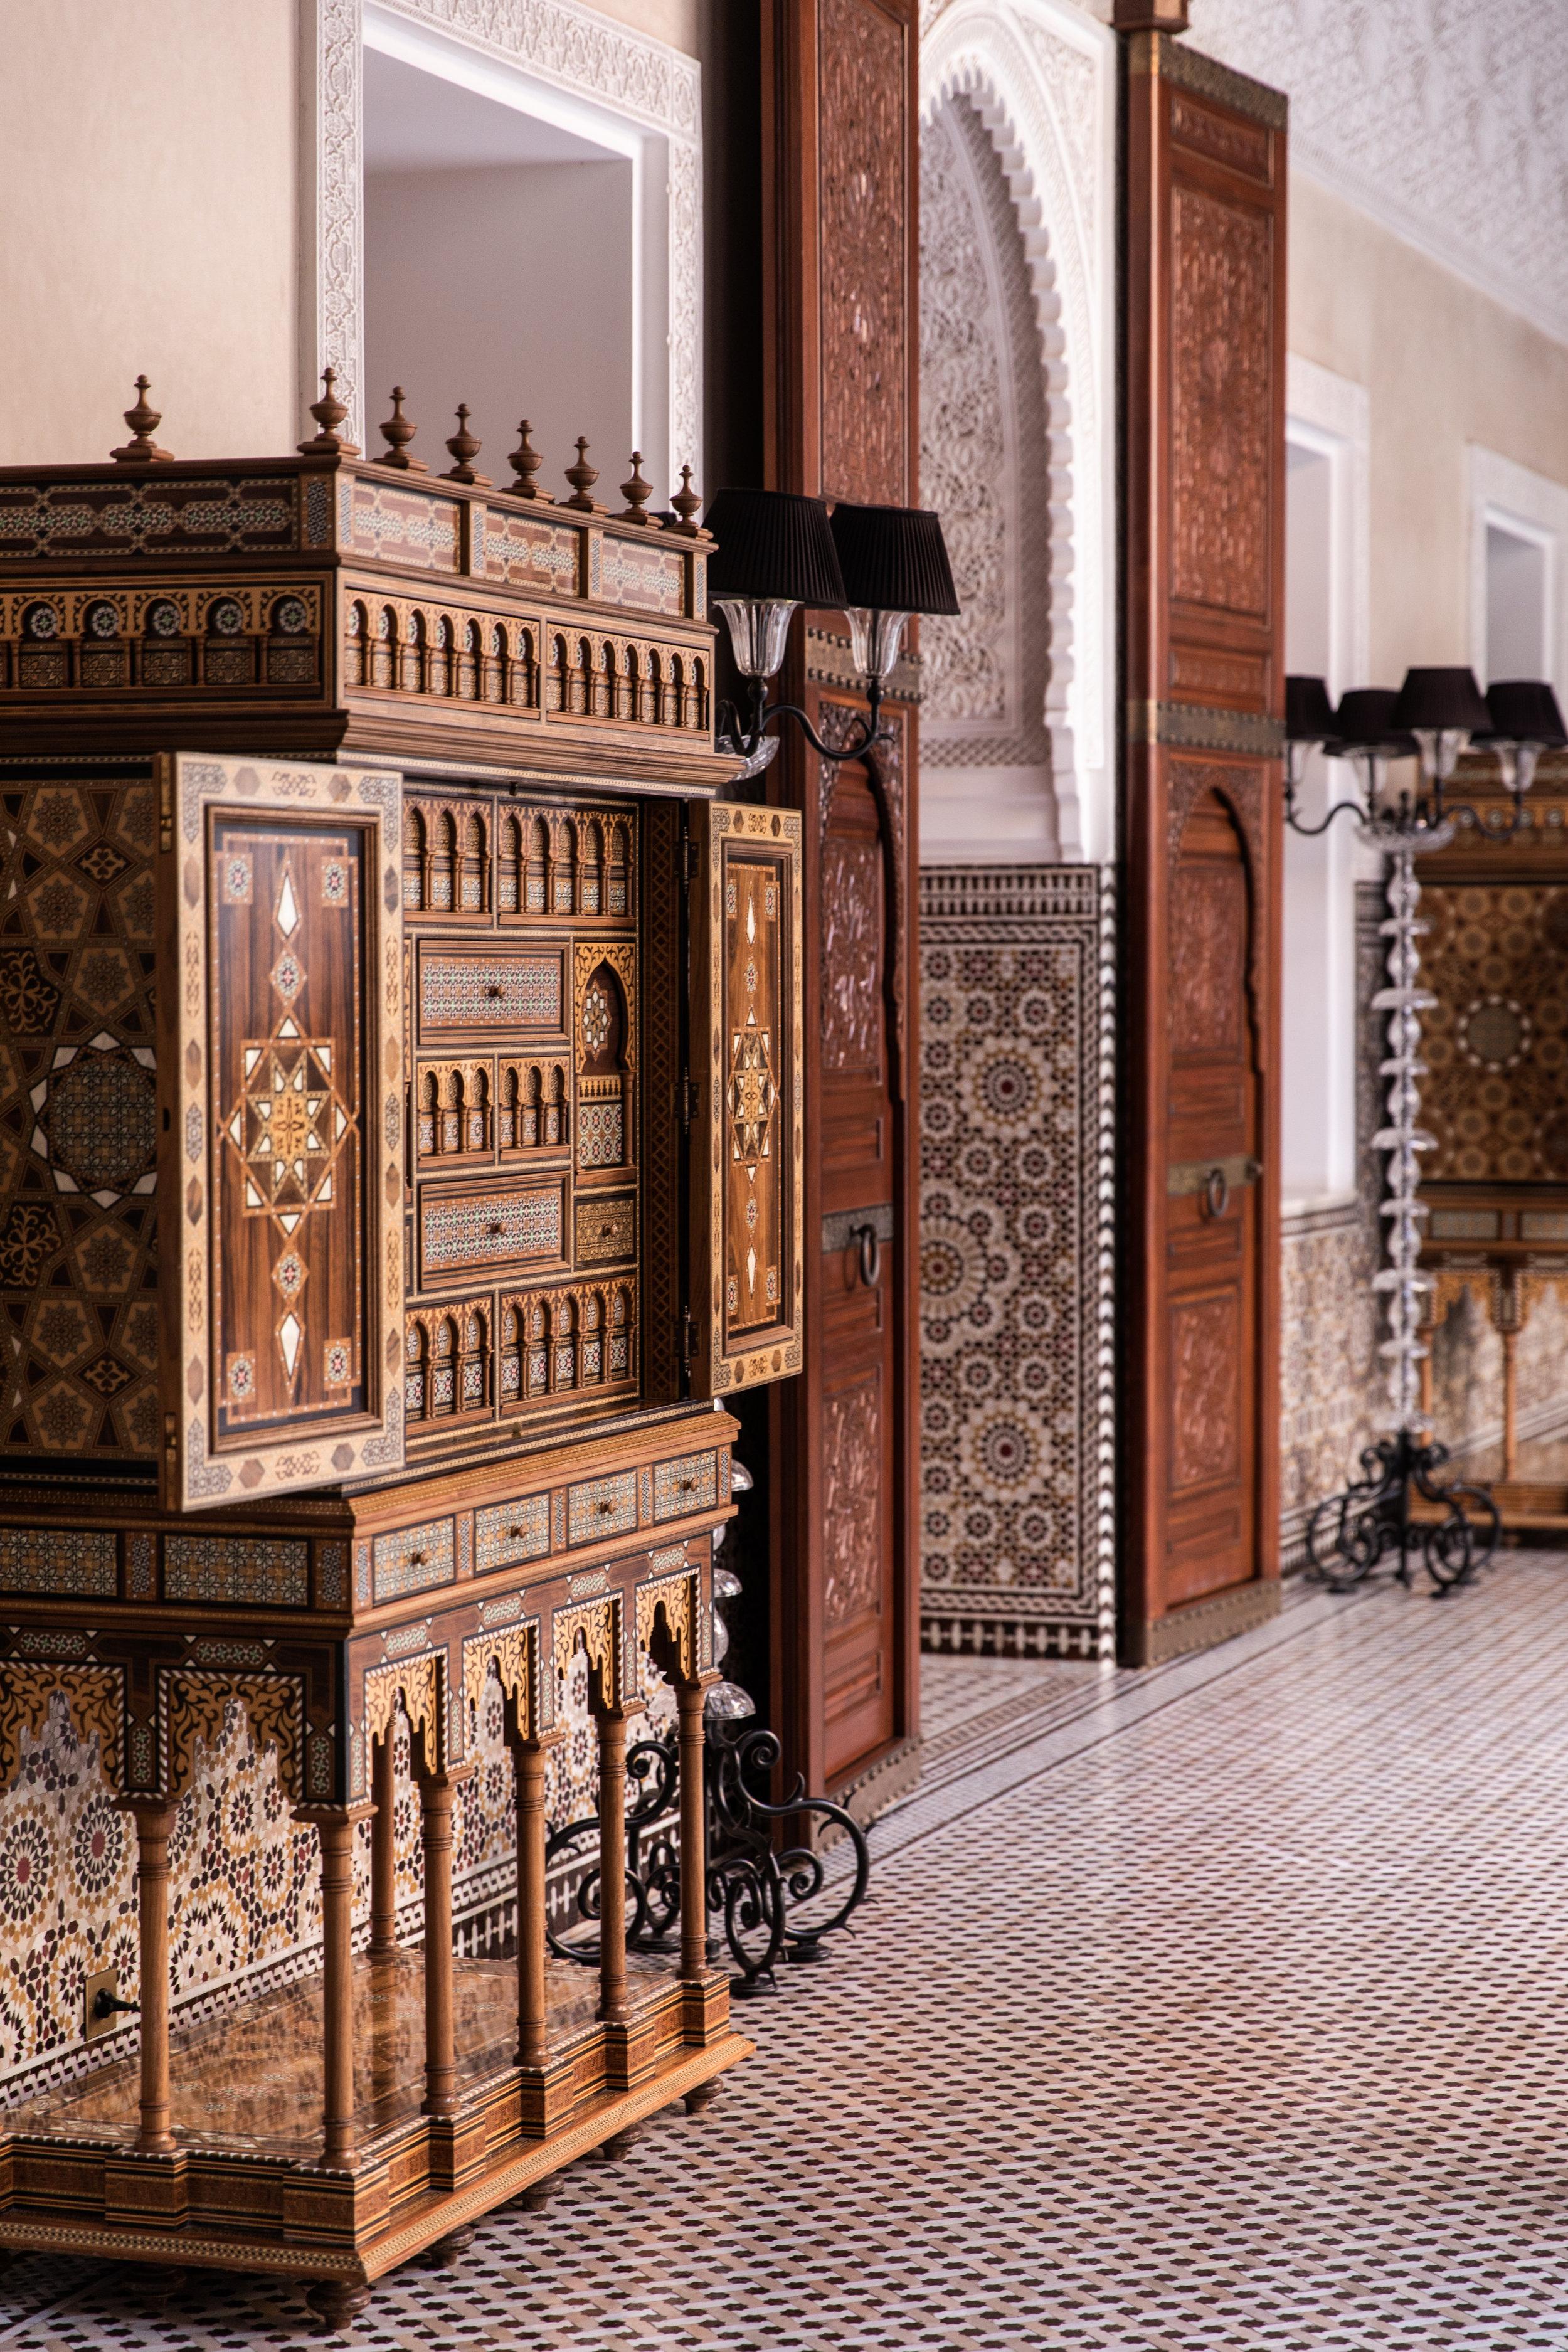 Morocco-3103.jpg